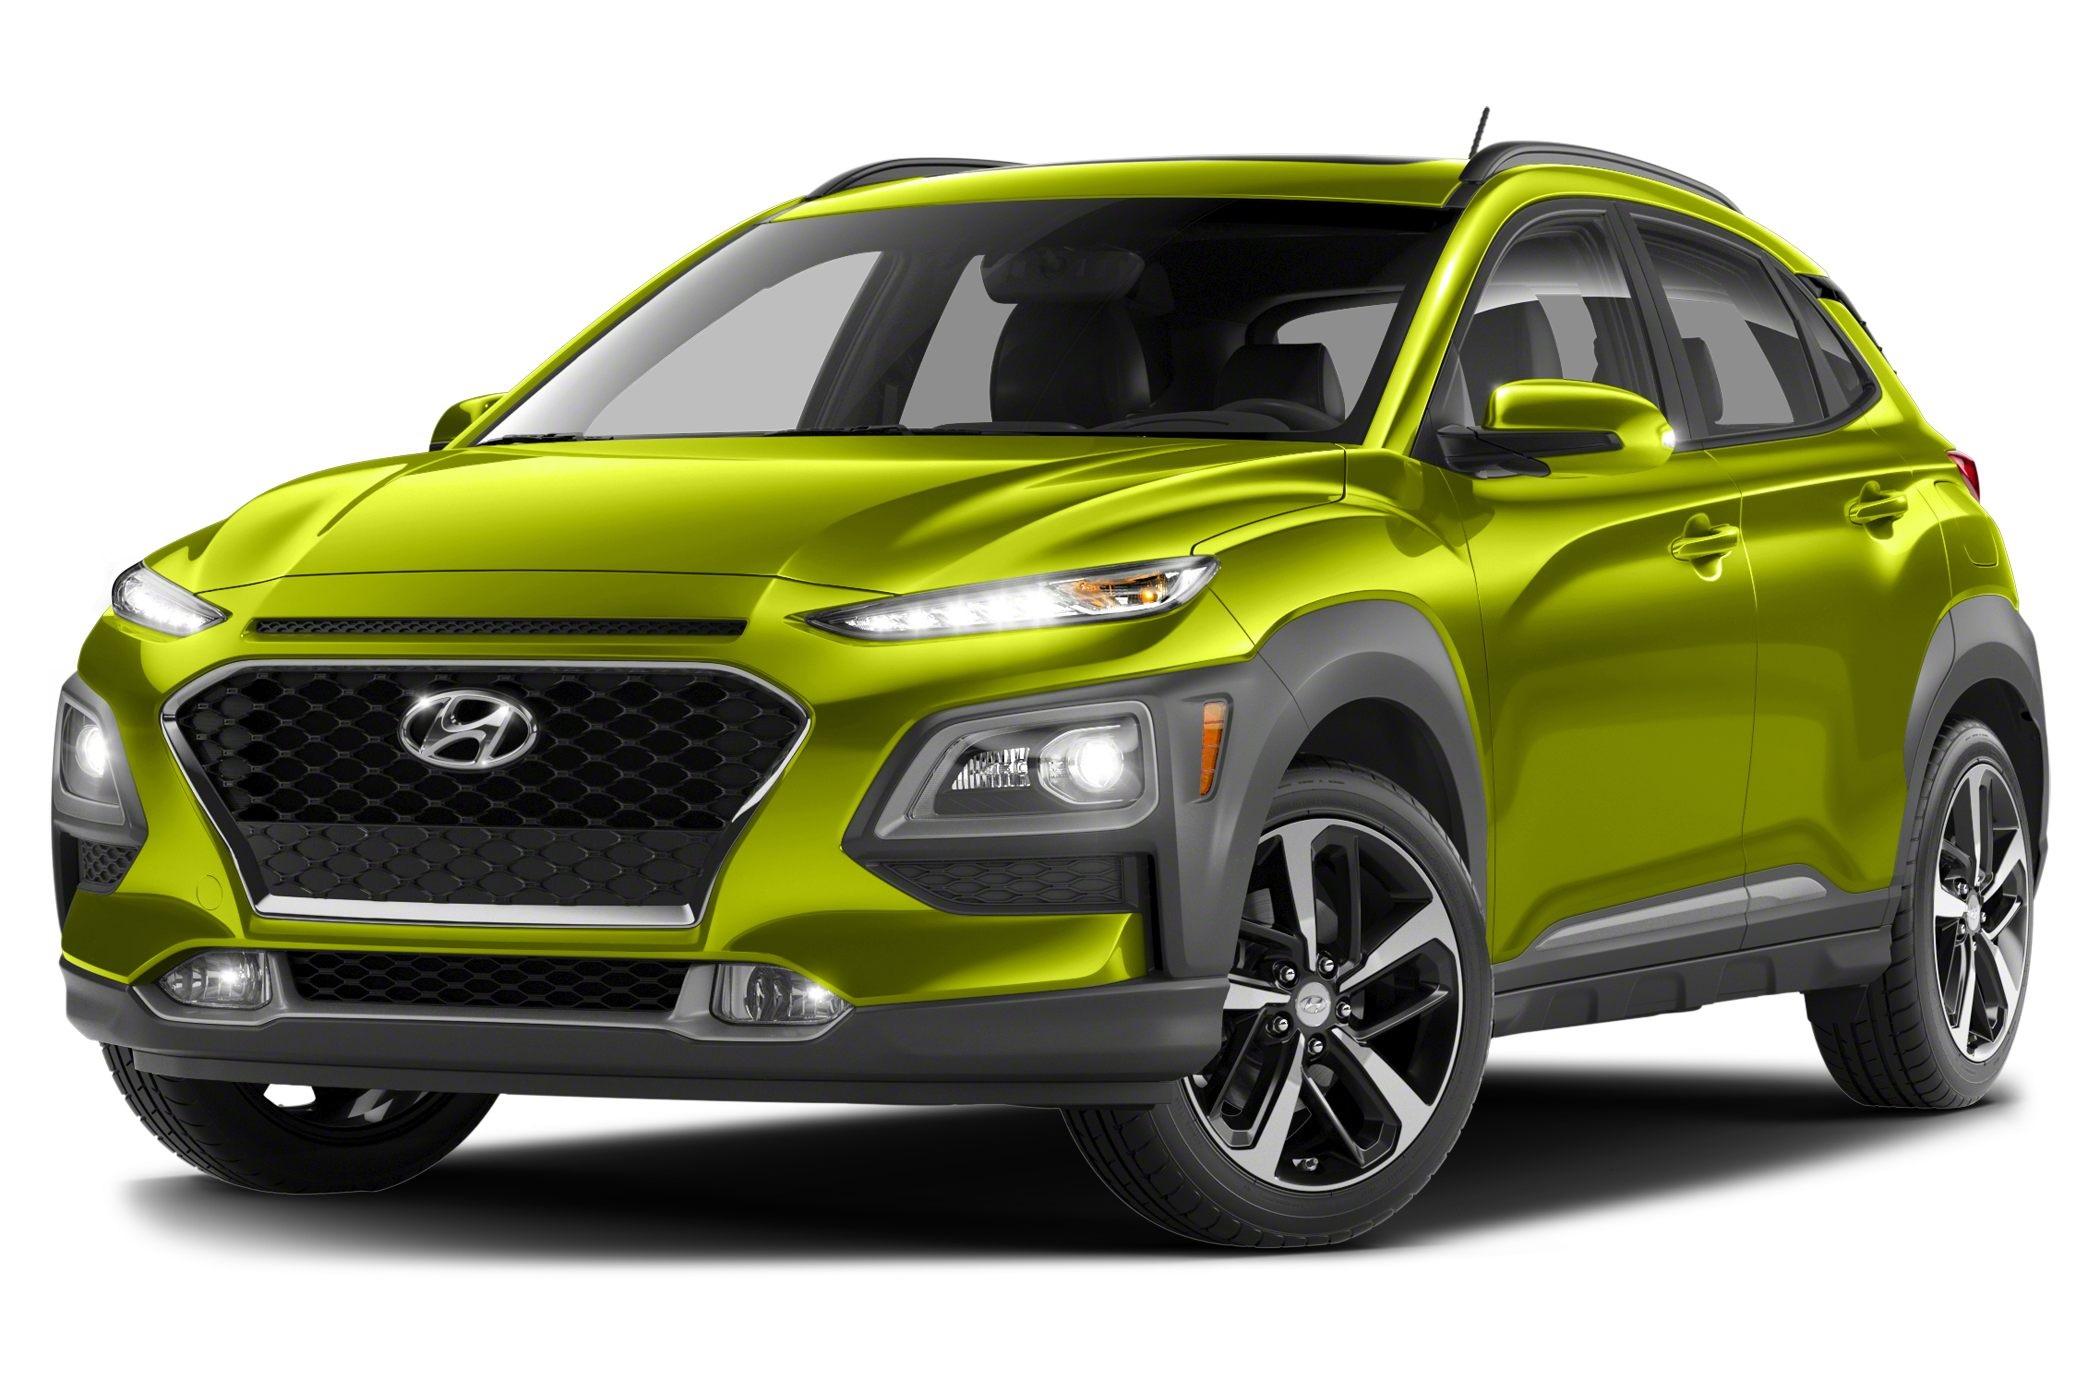 Hyundai Kona 2020 Prices In Uae Pictures Reviews Busydubai